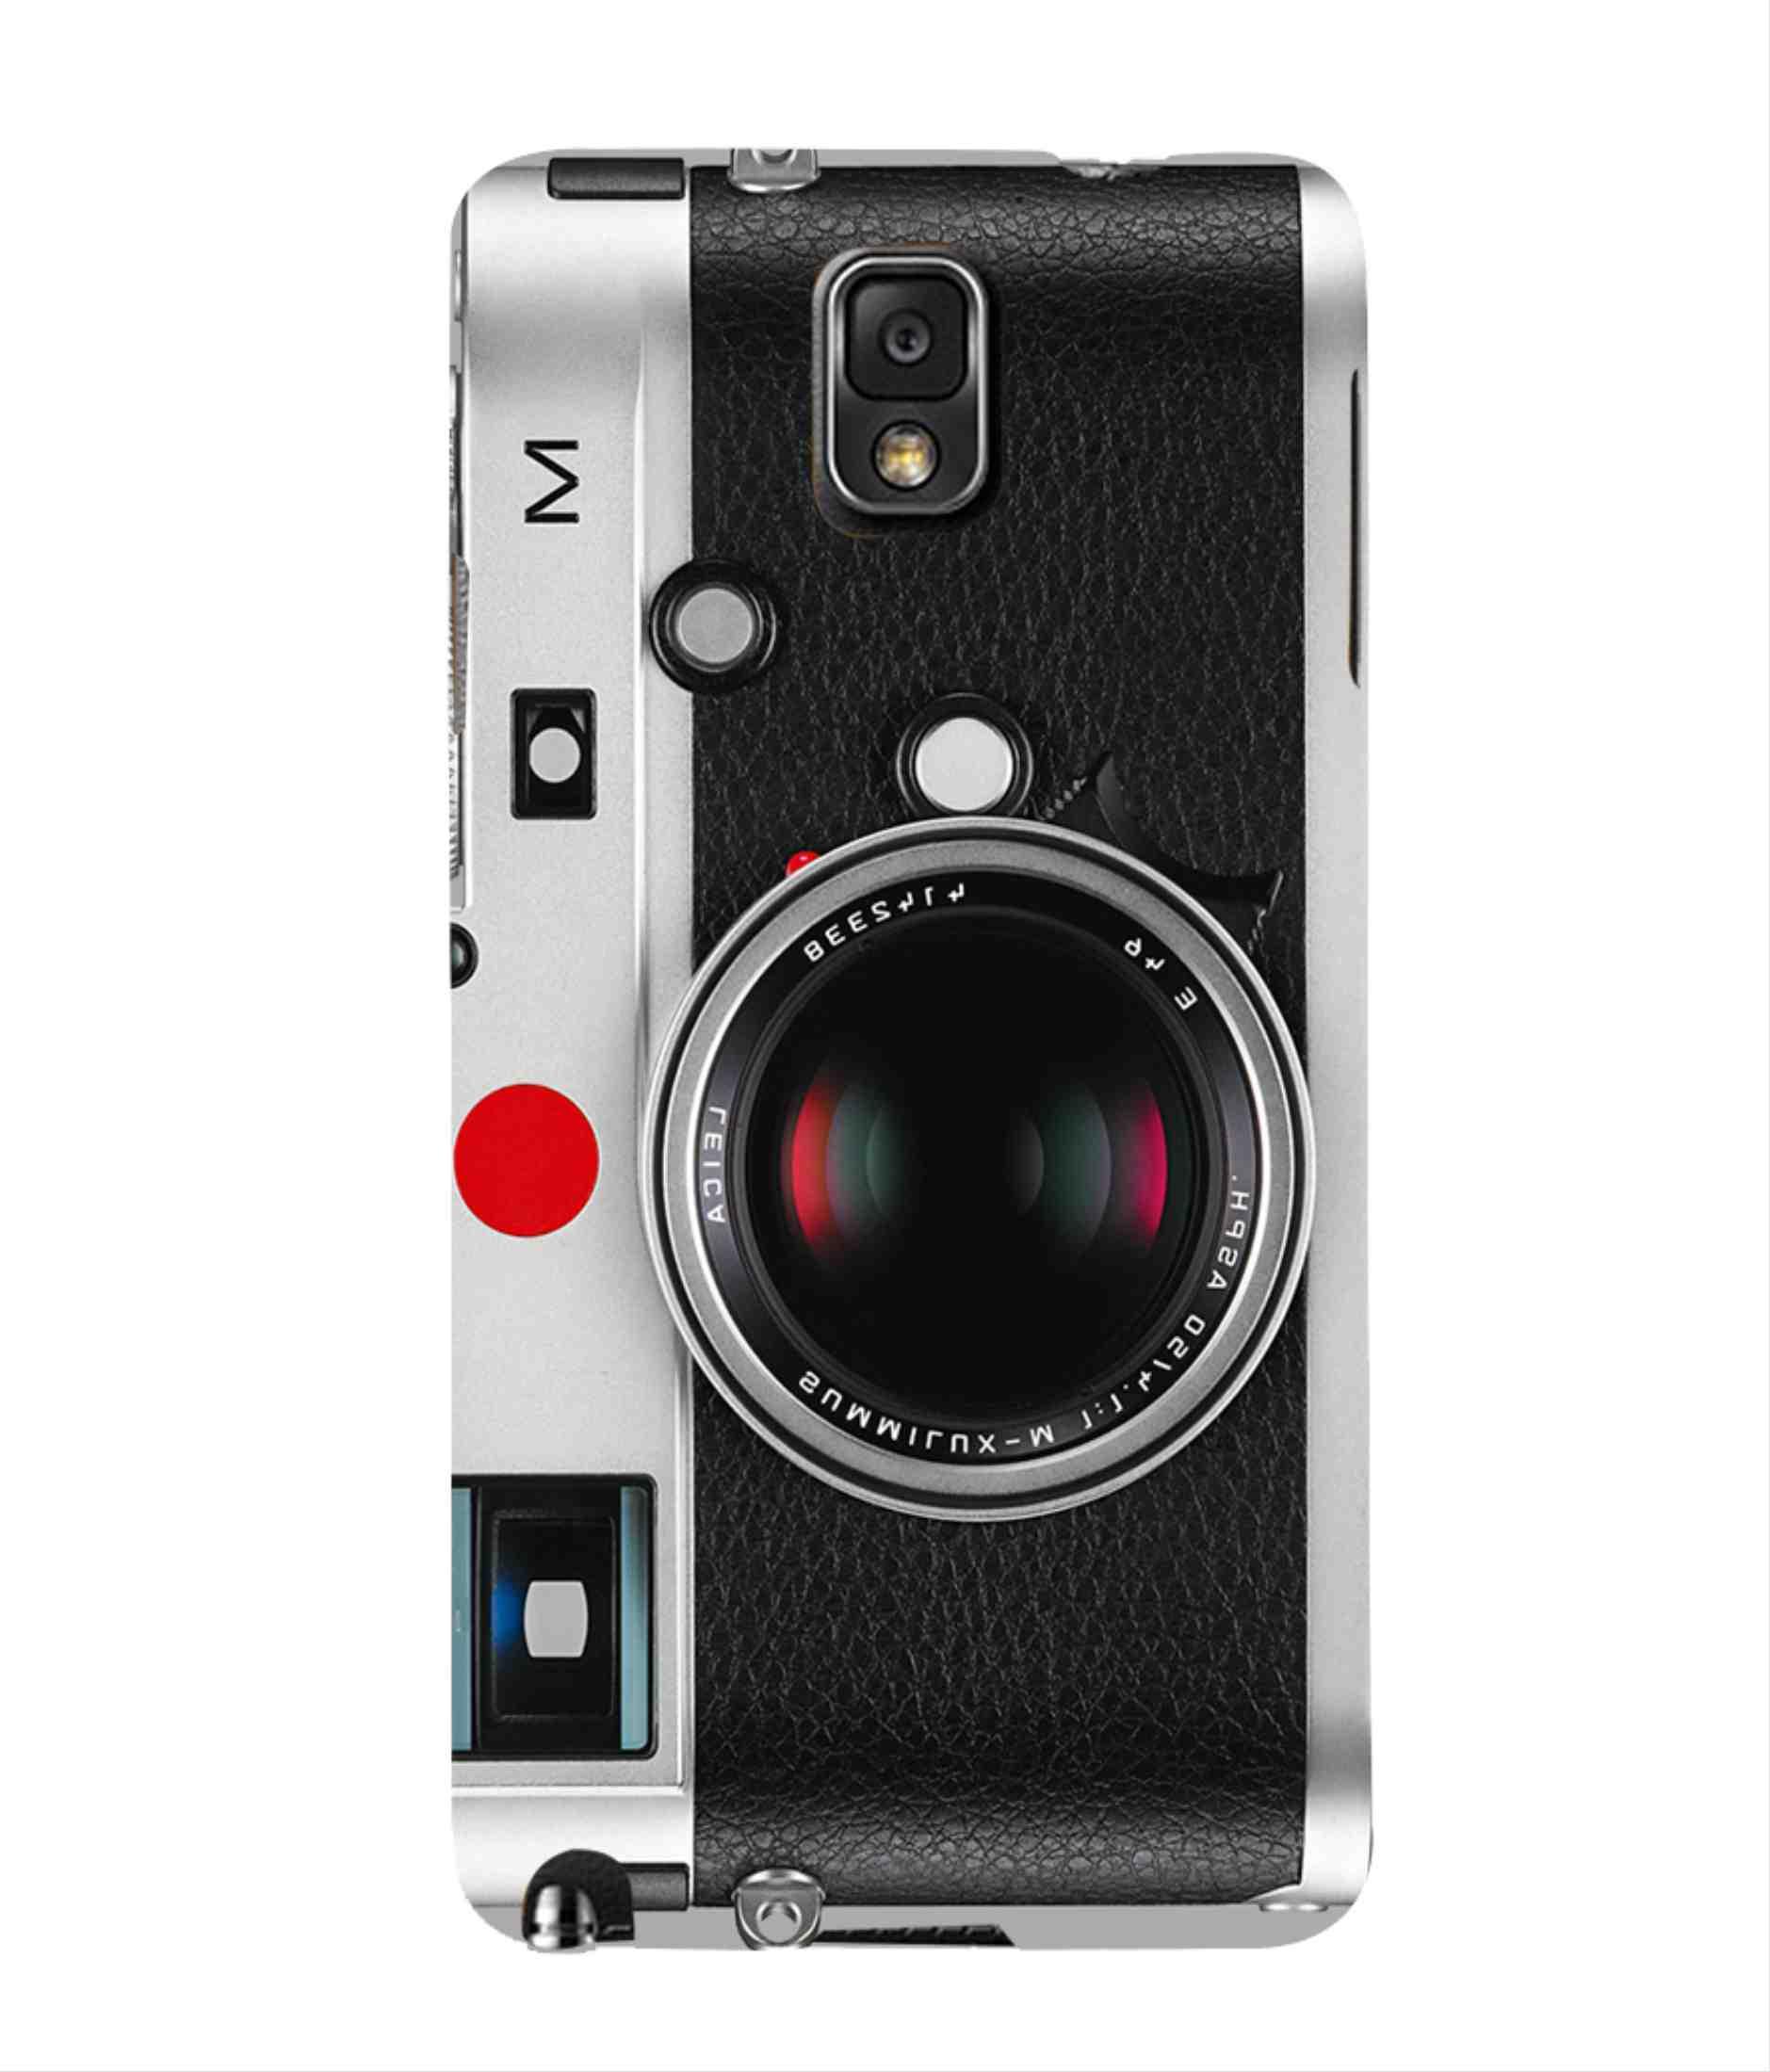 Vibrante Mobile Case Cover For Samsung Galaxy Note 3 , Samsung Galaxy Note Iii , Samsung Galaxy Note 3 N9002 , Samsung Galaxy Note N9000 N9005 28874